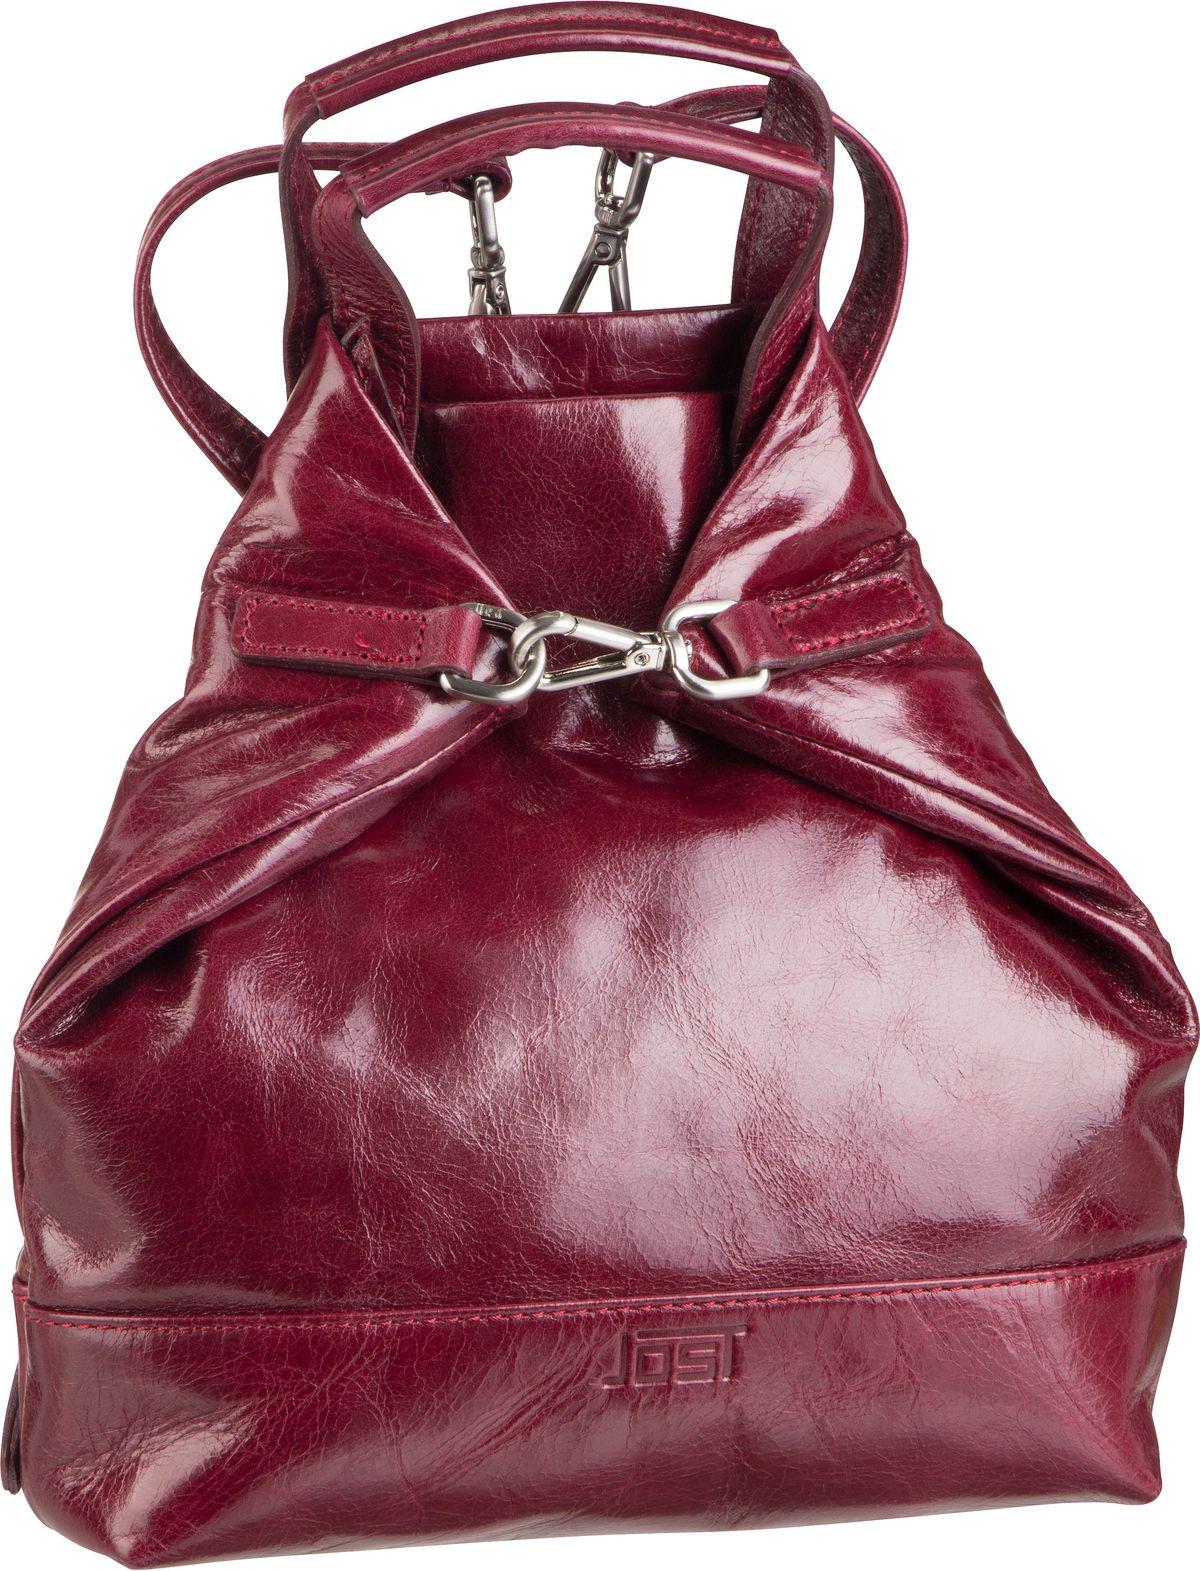 Rucksack / Daypack Boda 6617 X-Change Bag Mini Bordeaux